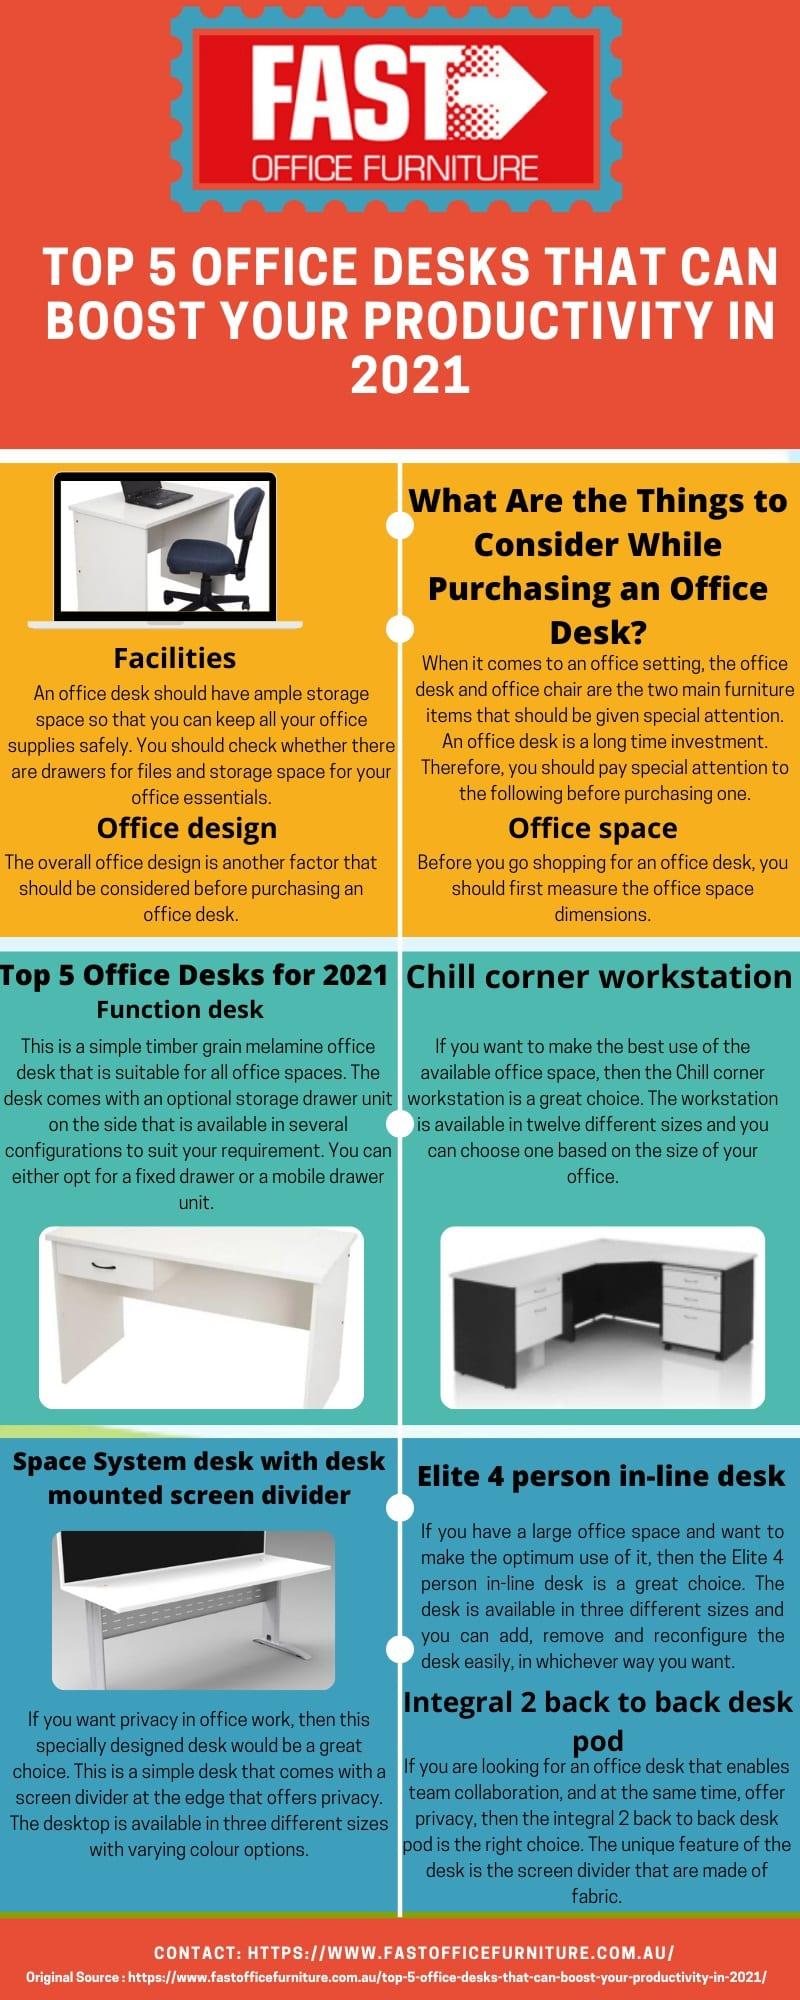 Top 5 Office Desks Infographic